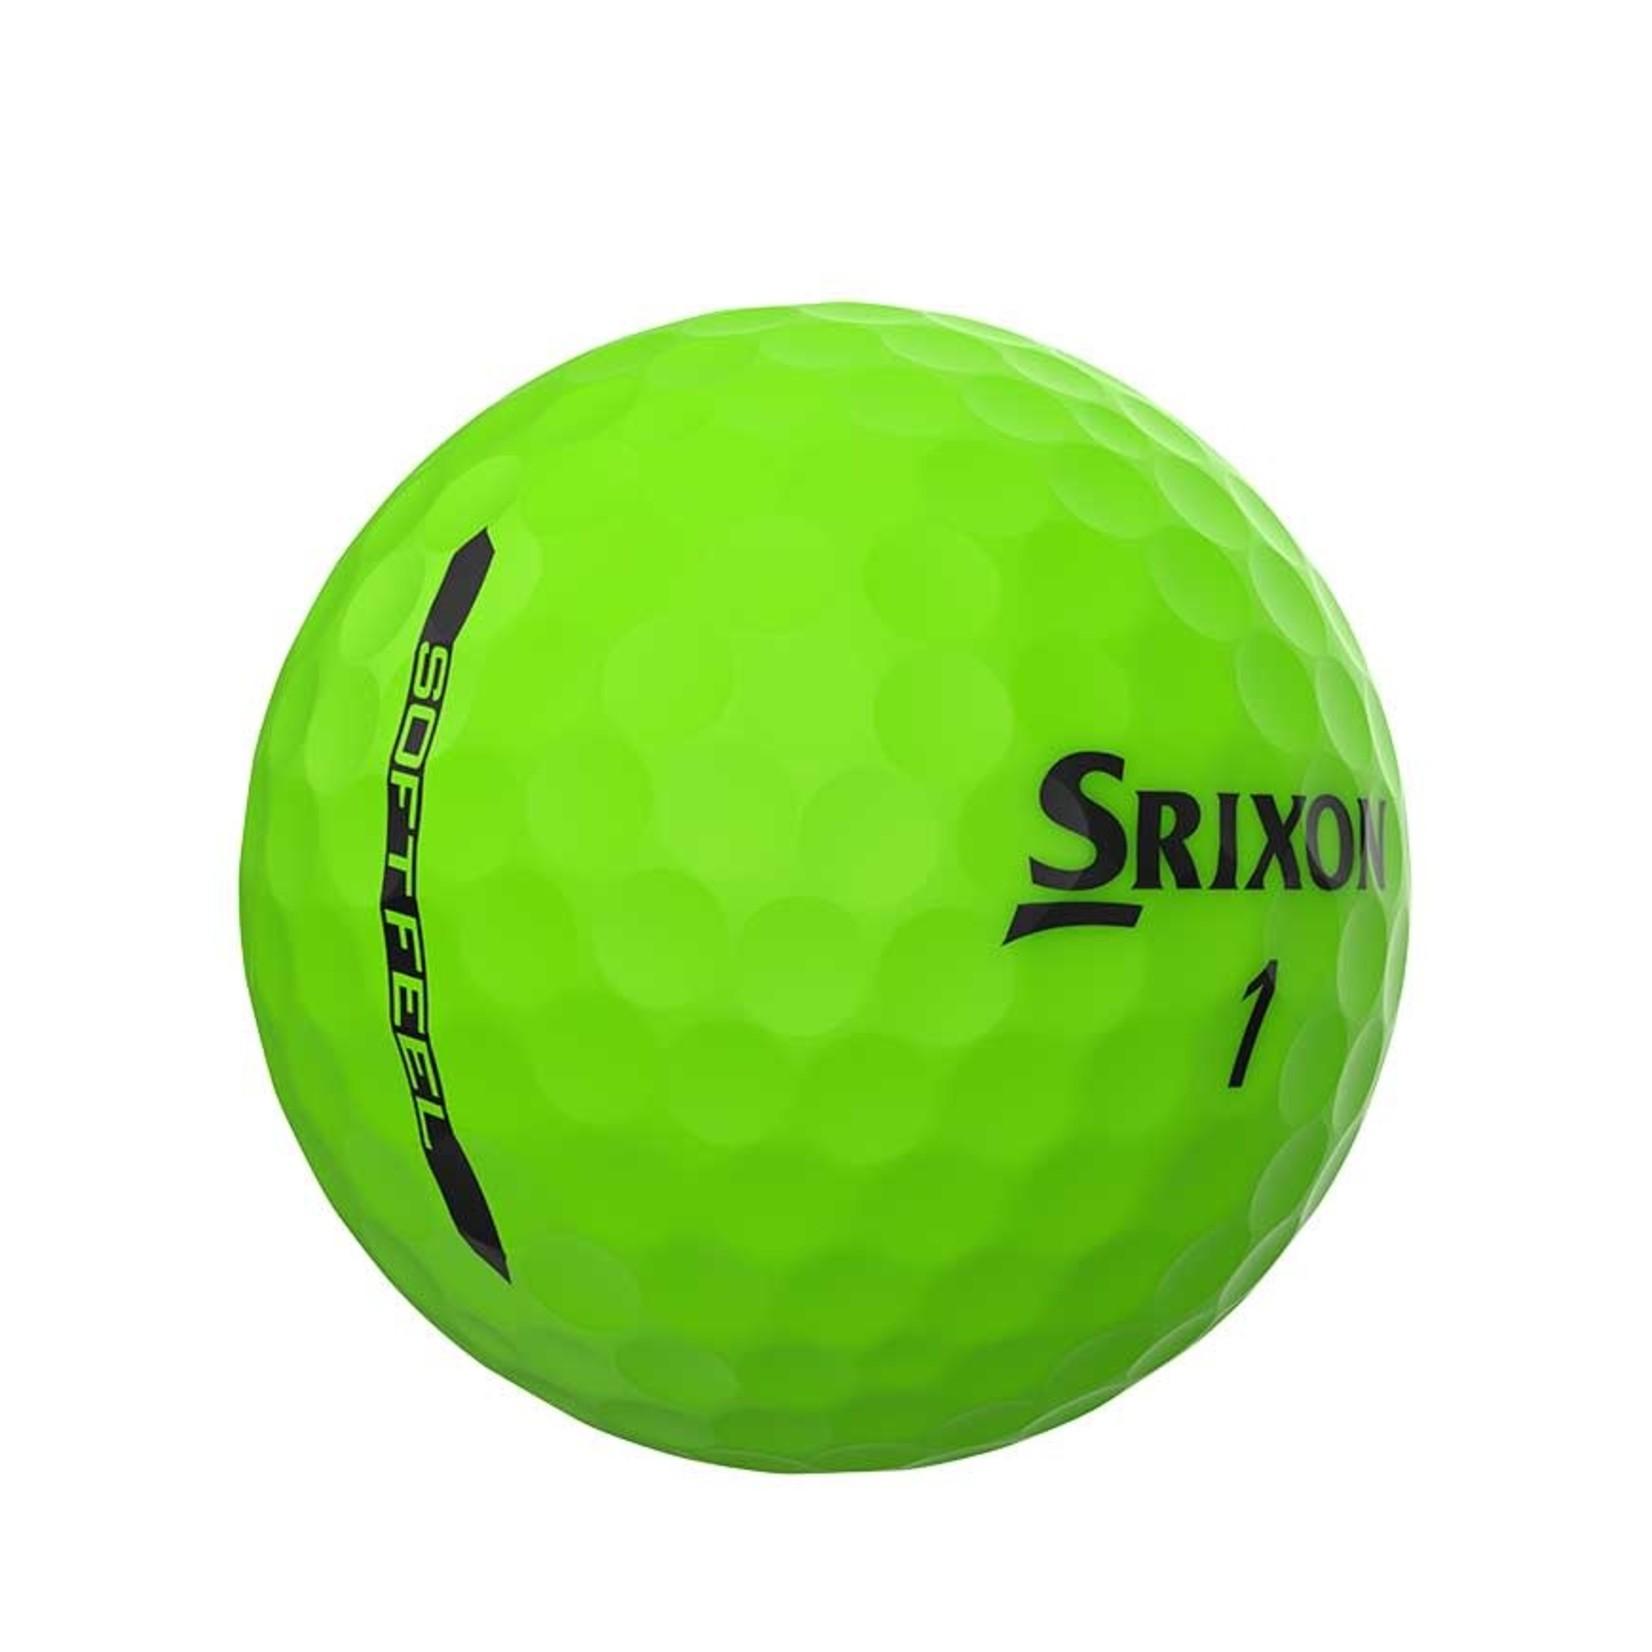 Srixon Srixon SoftFeel Brite Green